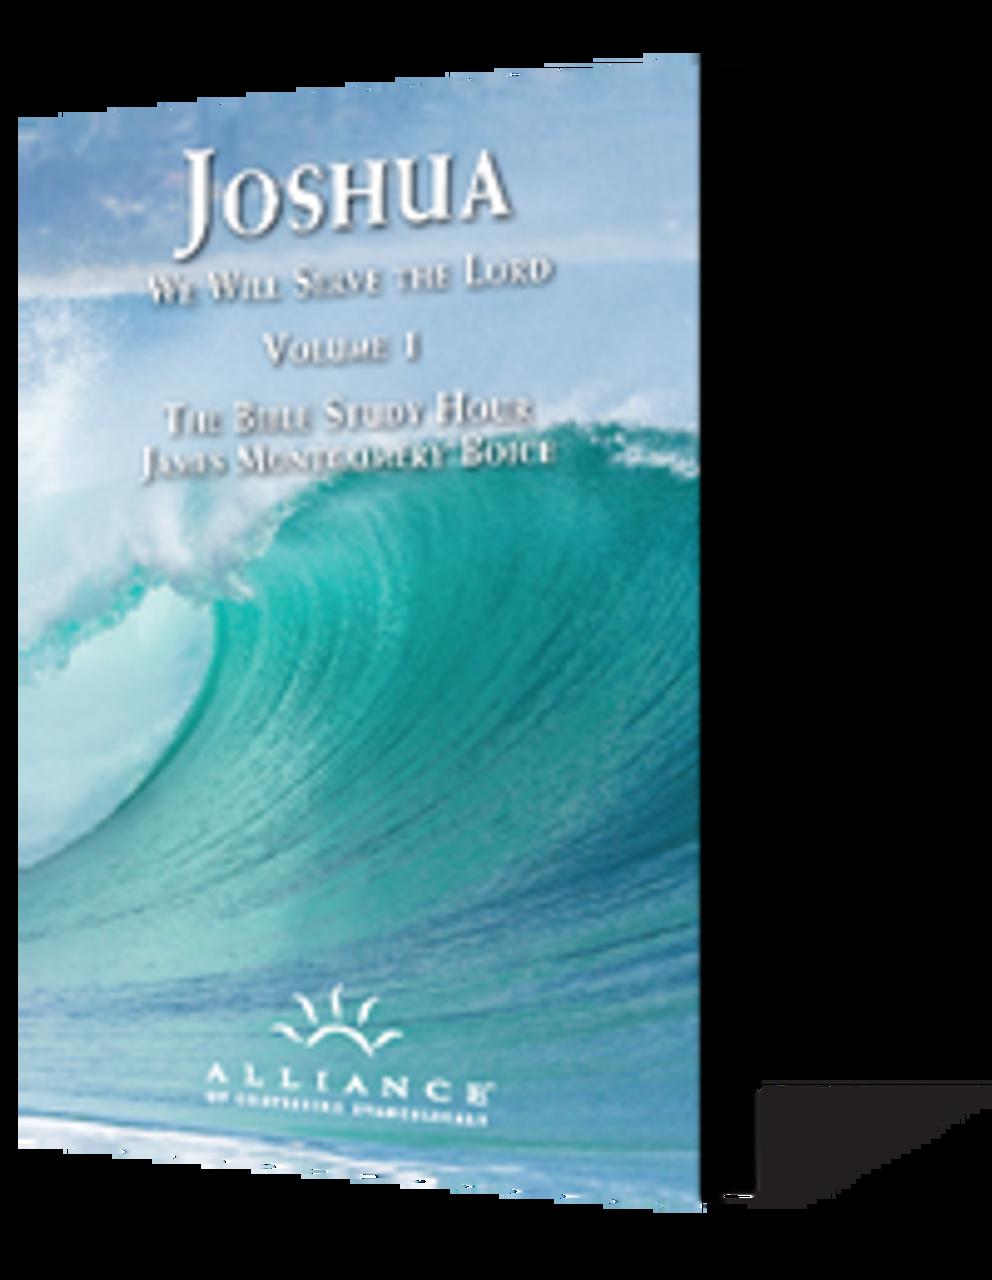 Joshua Anthology (Boice)(mp3 Disc)